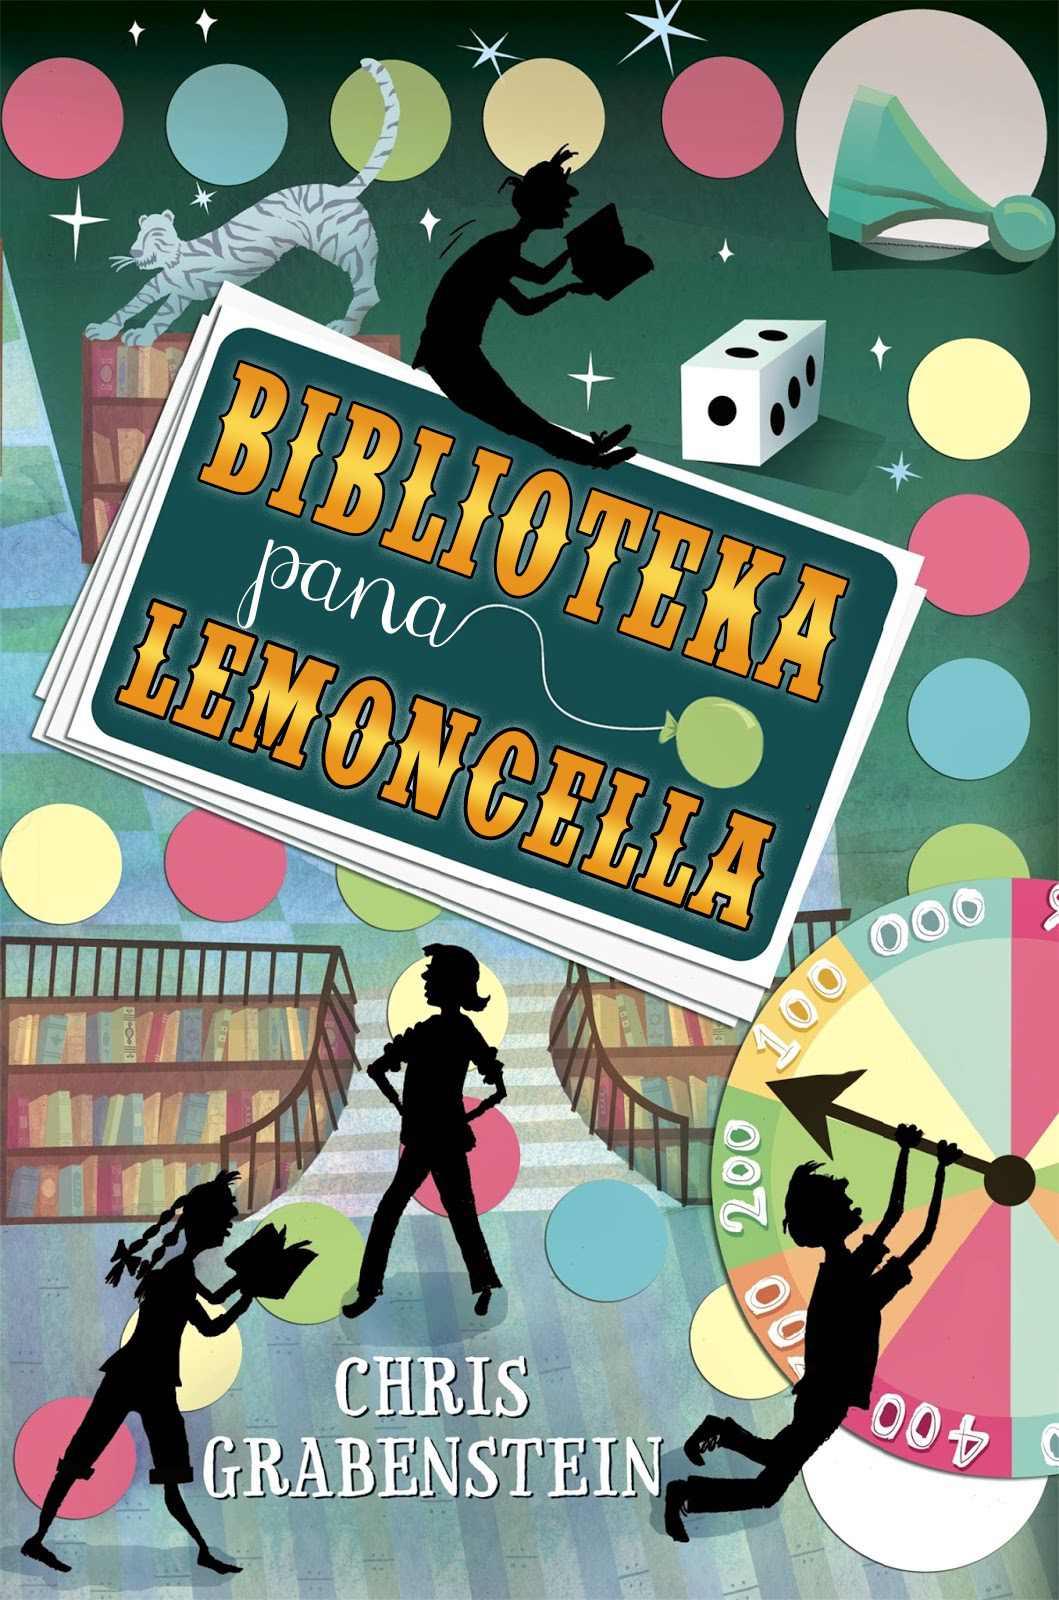 Biblioteka pana Lemoncella - Ebook (Książka na Kindle) do pobrania w formacie MOBI